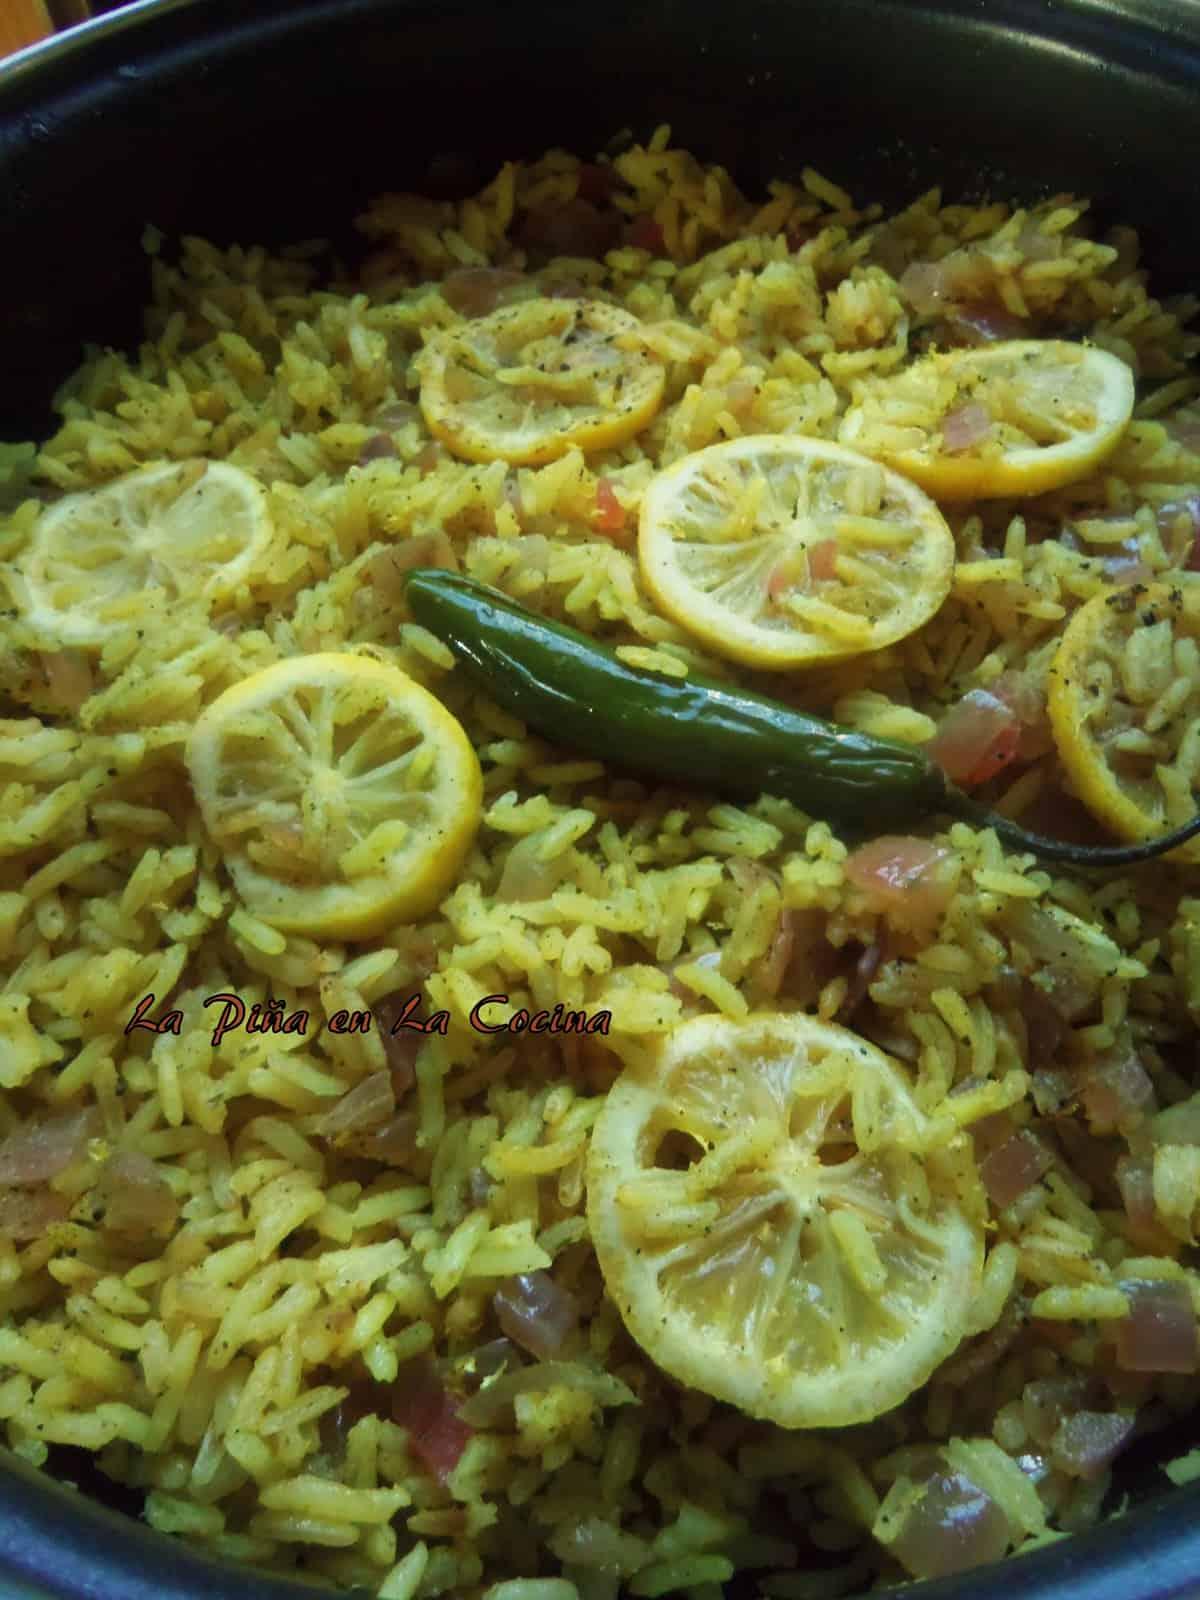 Lemon Infused Jasmine Rice with Chicken Broth